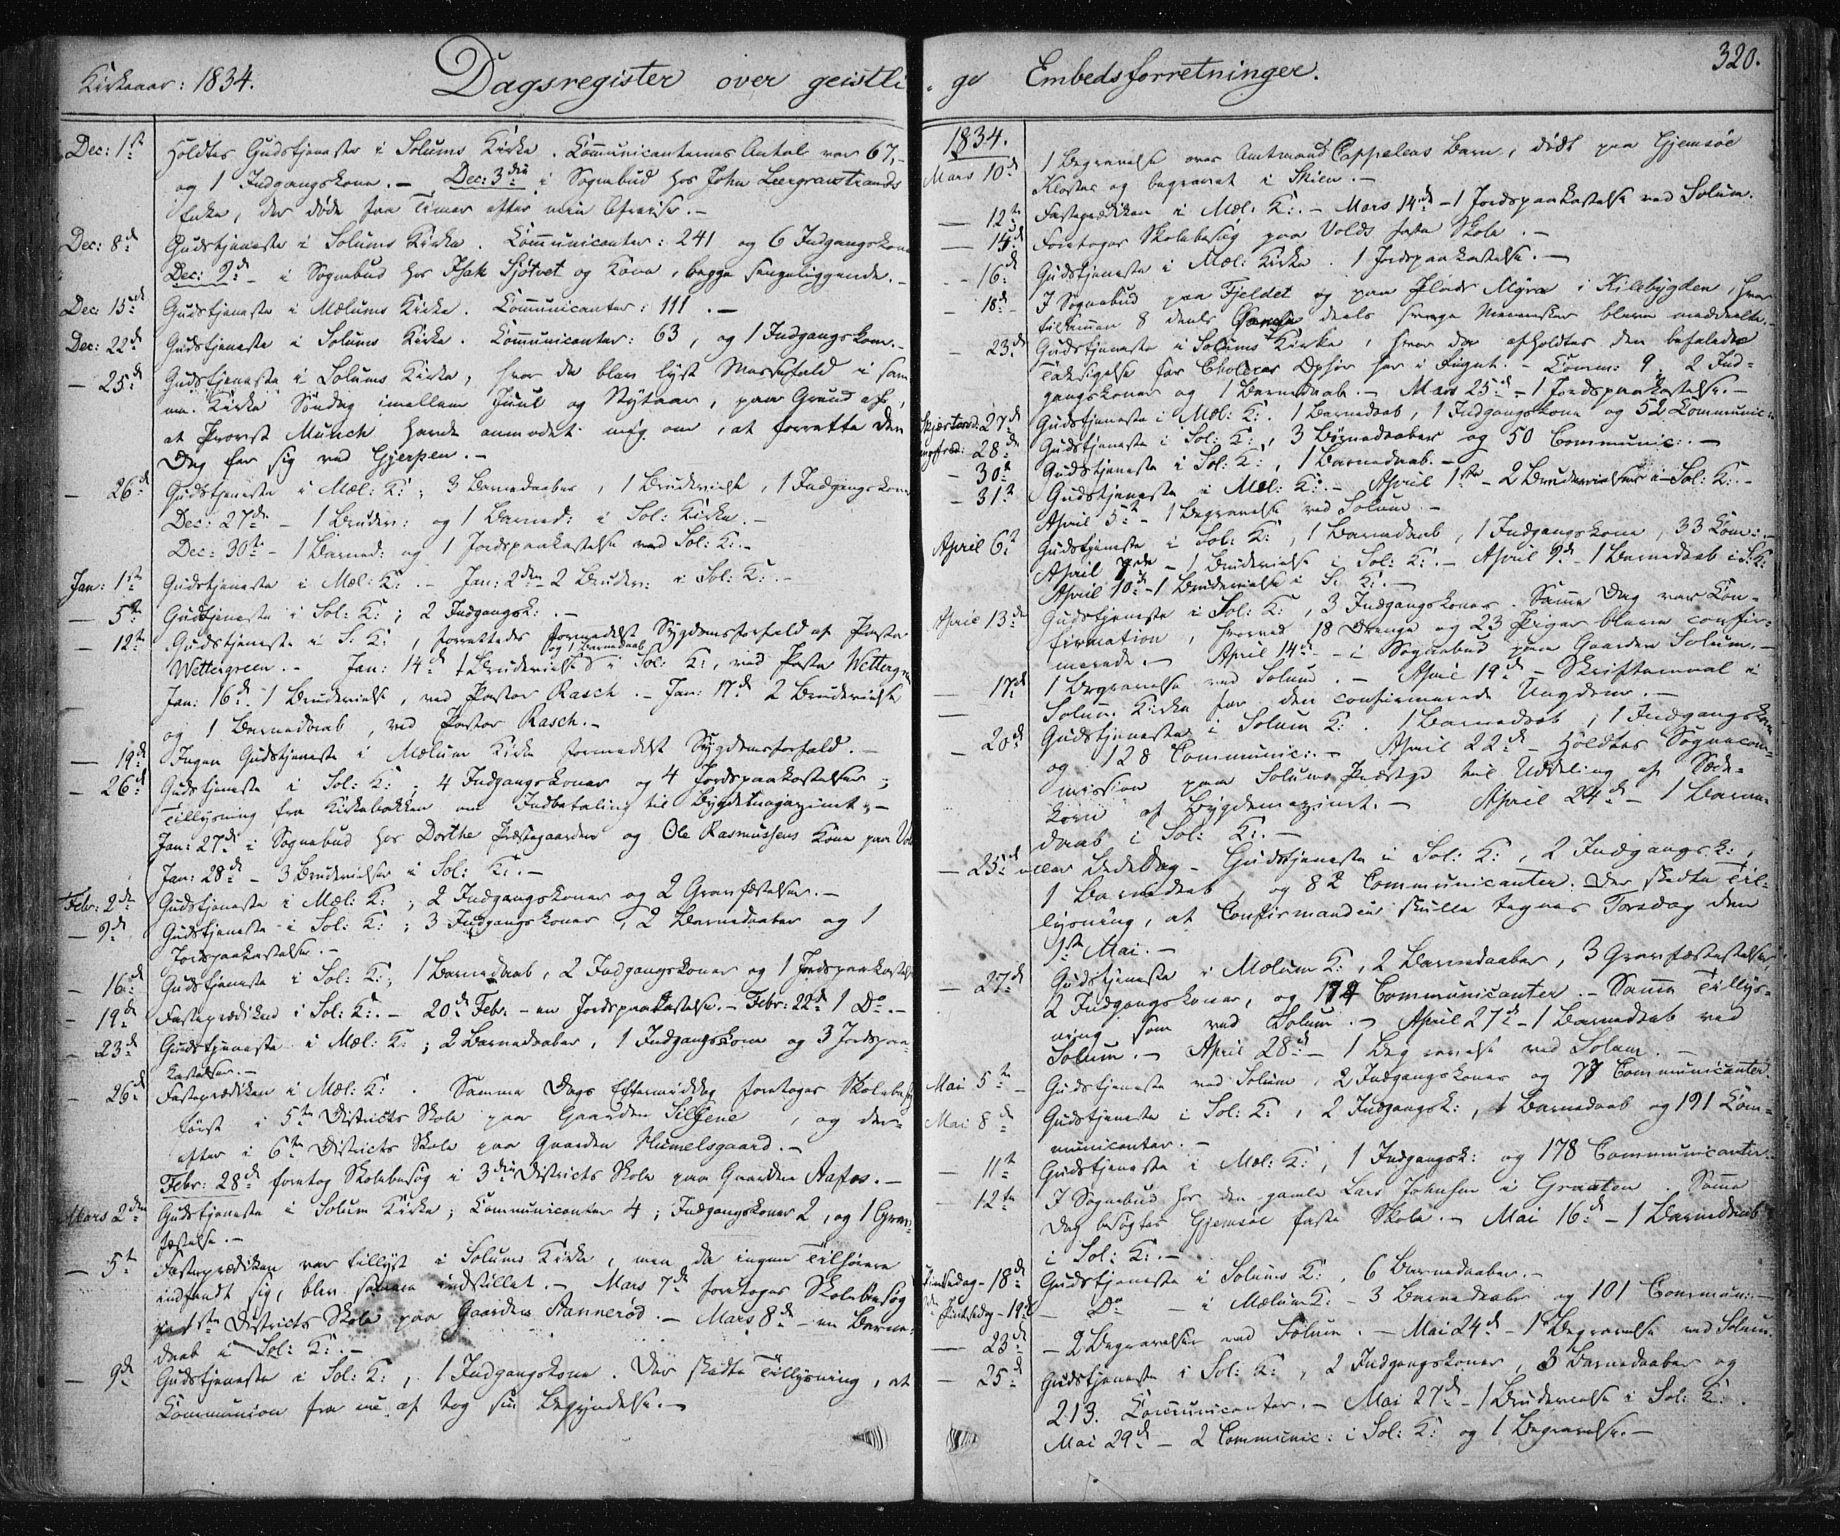 SAKO, Solum kirkebøker, F/Fa/L0005: Ministerialbok nr. I 5, 1833-1843, s. 320